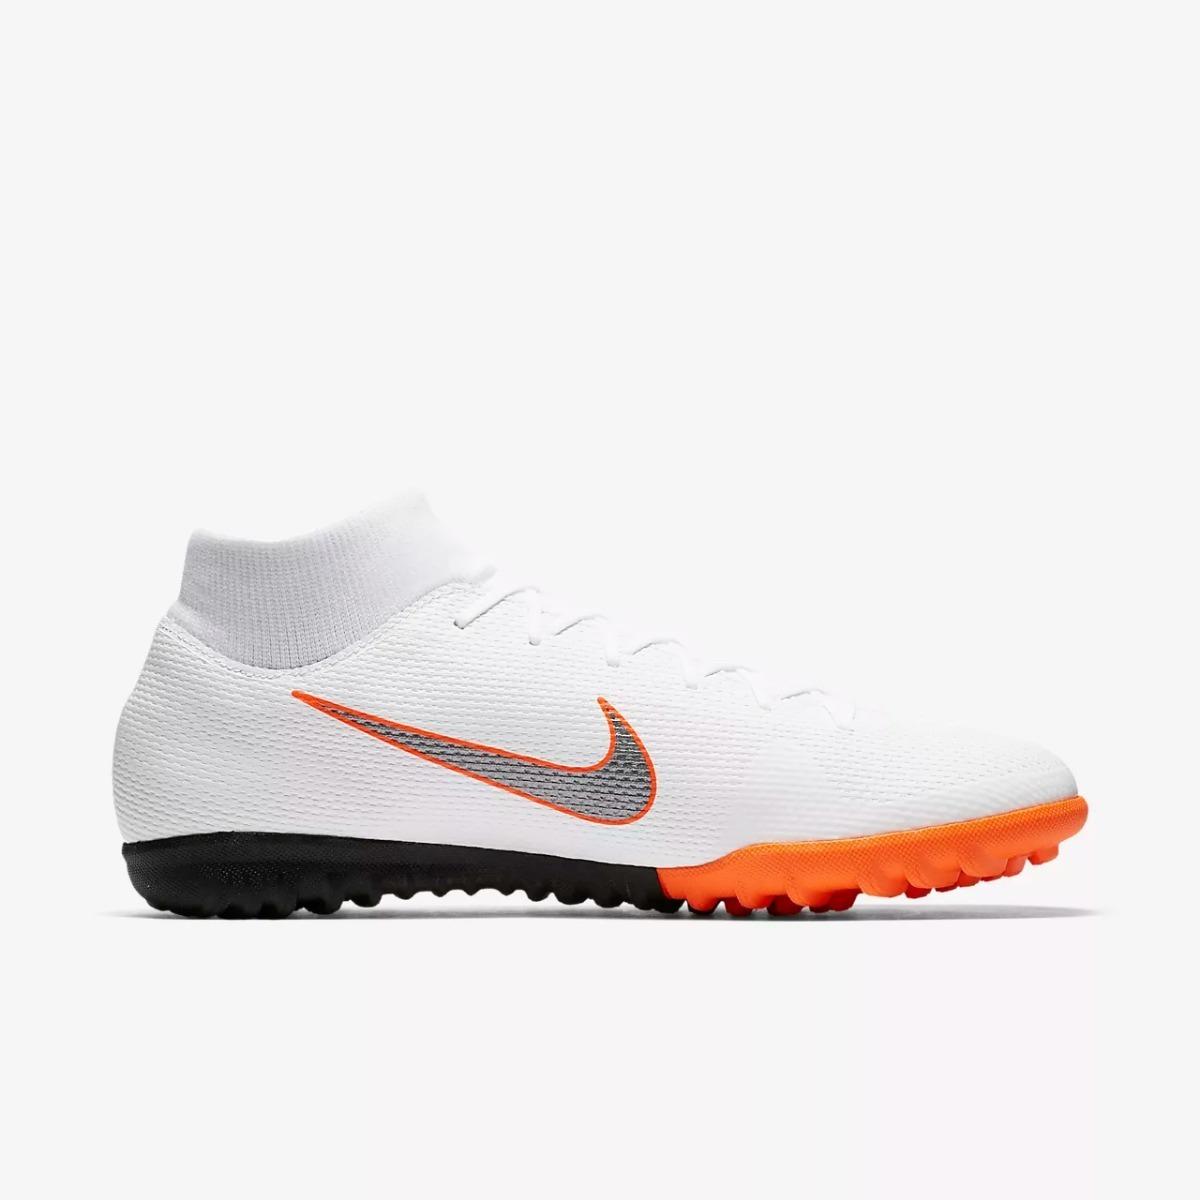 ac9be6f03f38a botas nike mercurial superfly blancos futbol rapido turf. Cargando zoom.